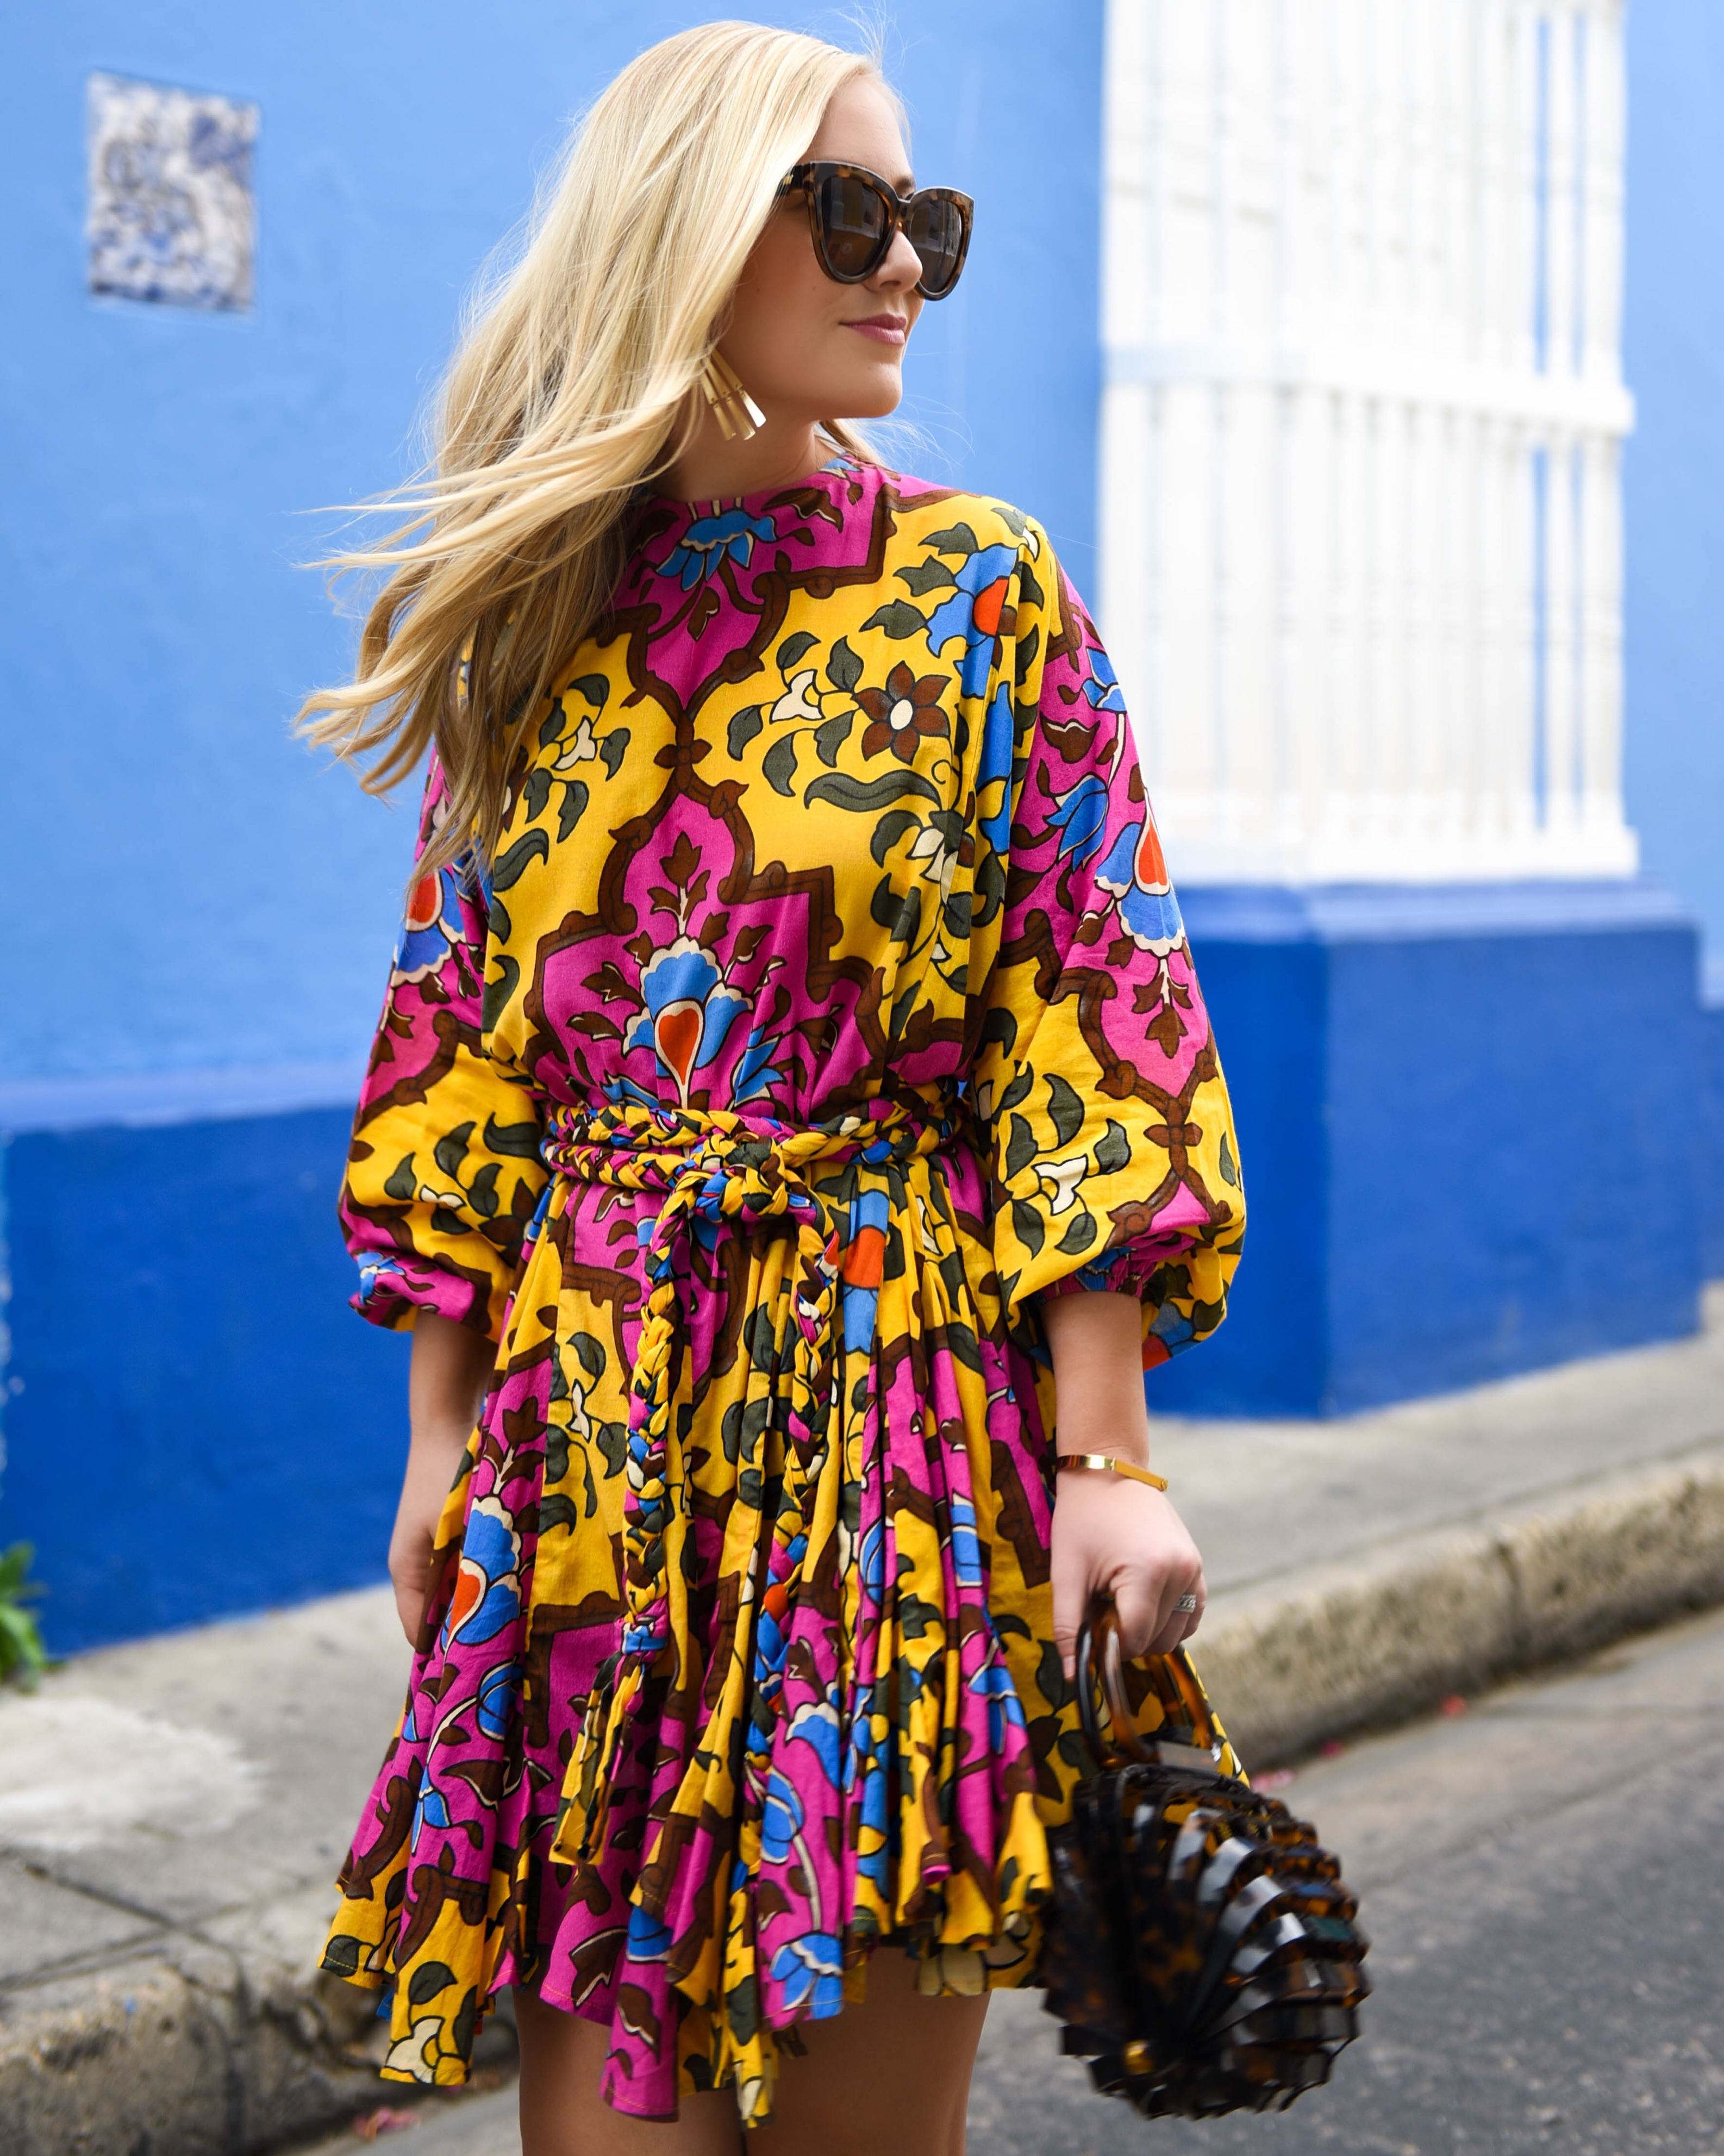 Ella belted printed cotton mini dress, Rhode Resort Dress, Net-A-Porter Dress, cult Gaia Bag, Colorful Dress, Lo Murphy, Travel Blogger, Cartagena, Dallas Blogger, Schutz Shoes, Yellow Sandals